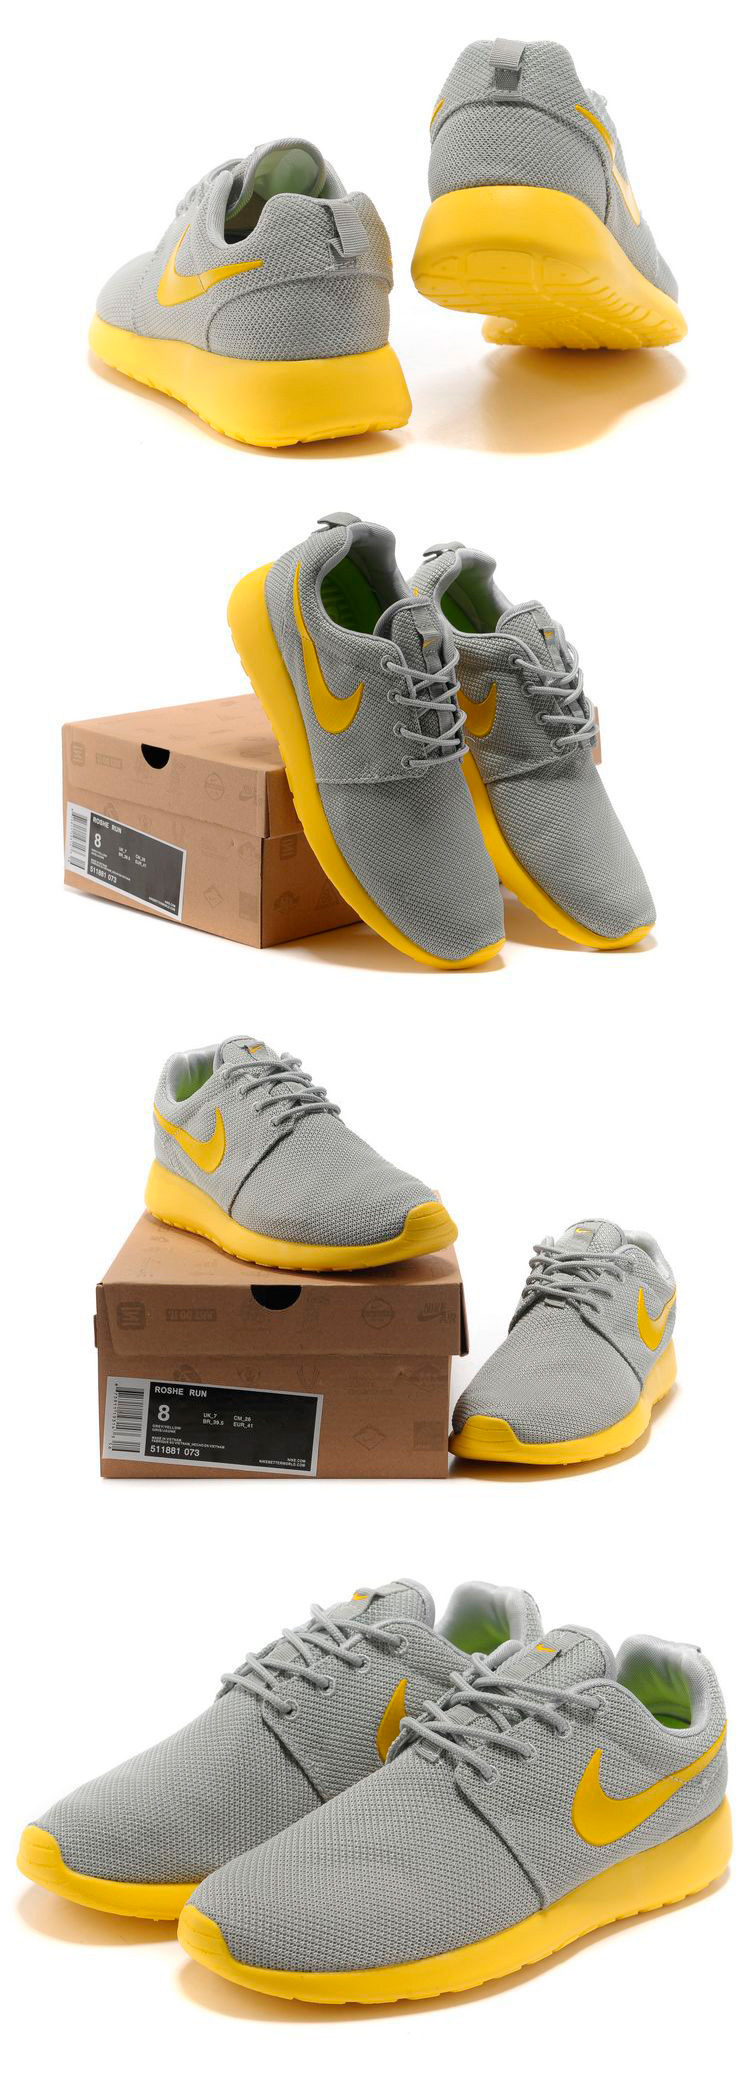 большое фото №6 Nike Roshe Run серо желтые